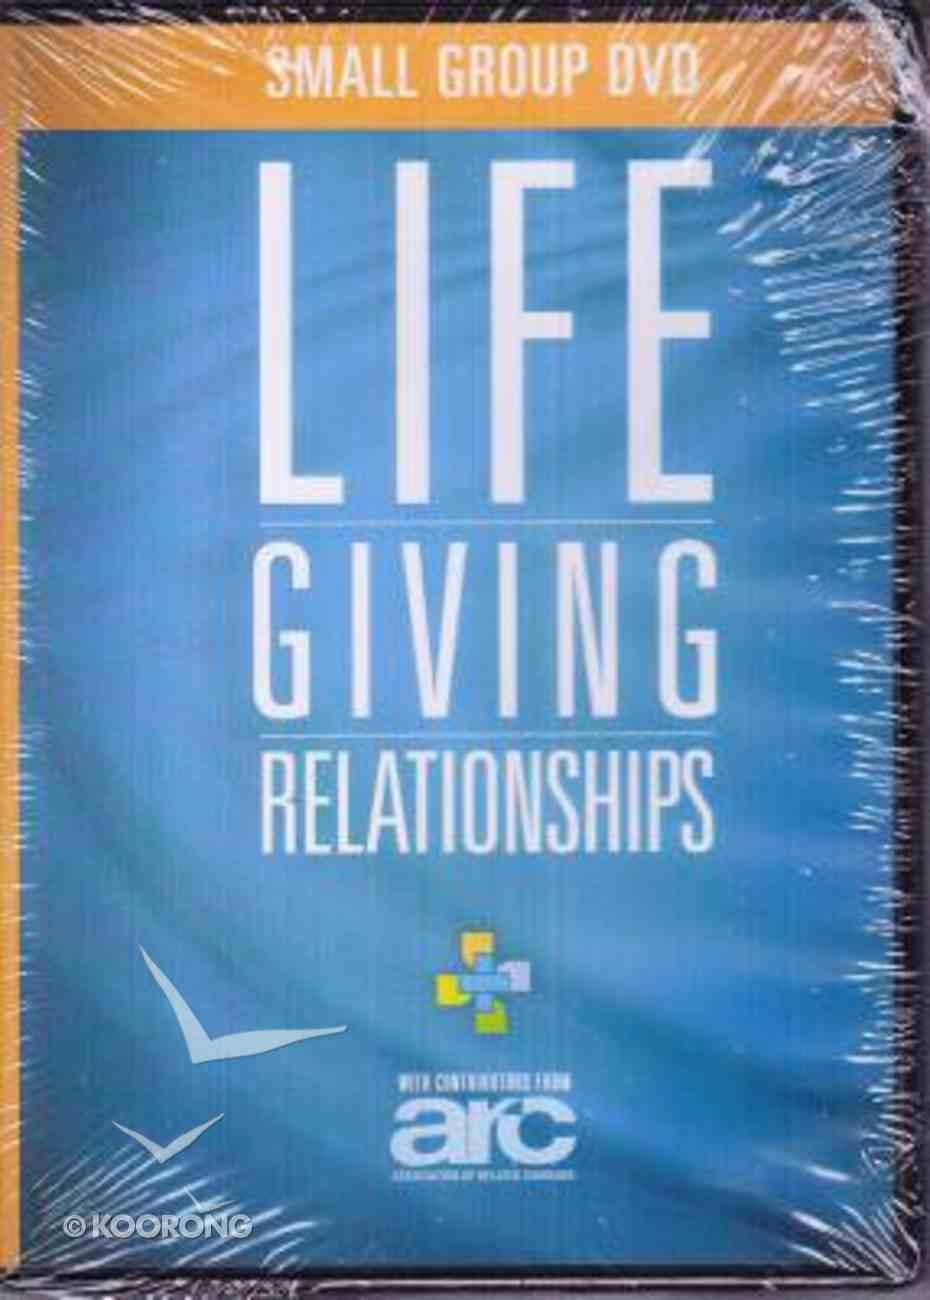 Lifegiving Relationships (Dvd) DVD